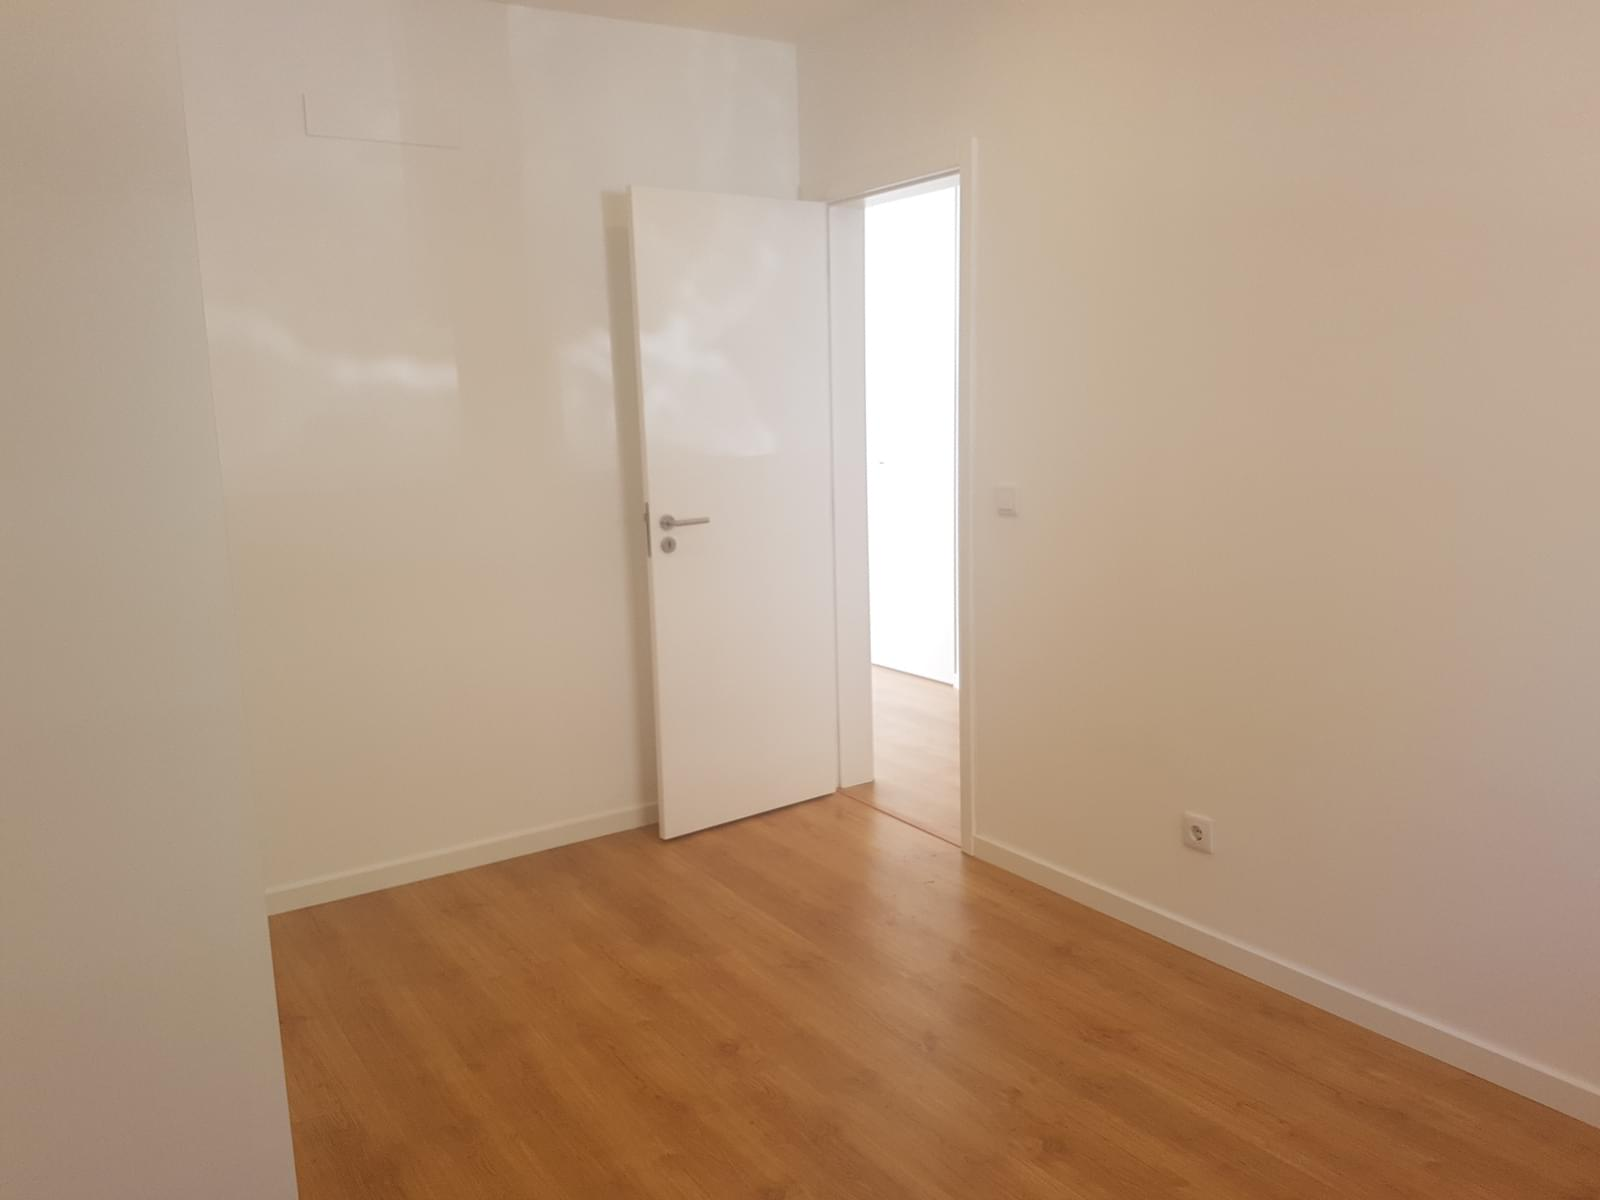 pf16986-apartamento-t2-cascais-e6516048-15a9-4a53-8095-447d00d2190e